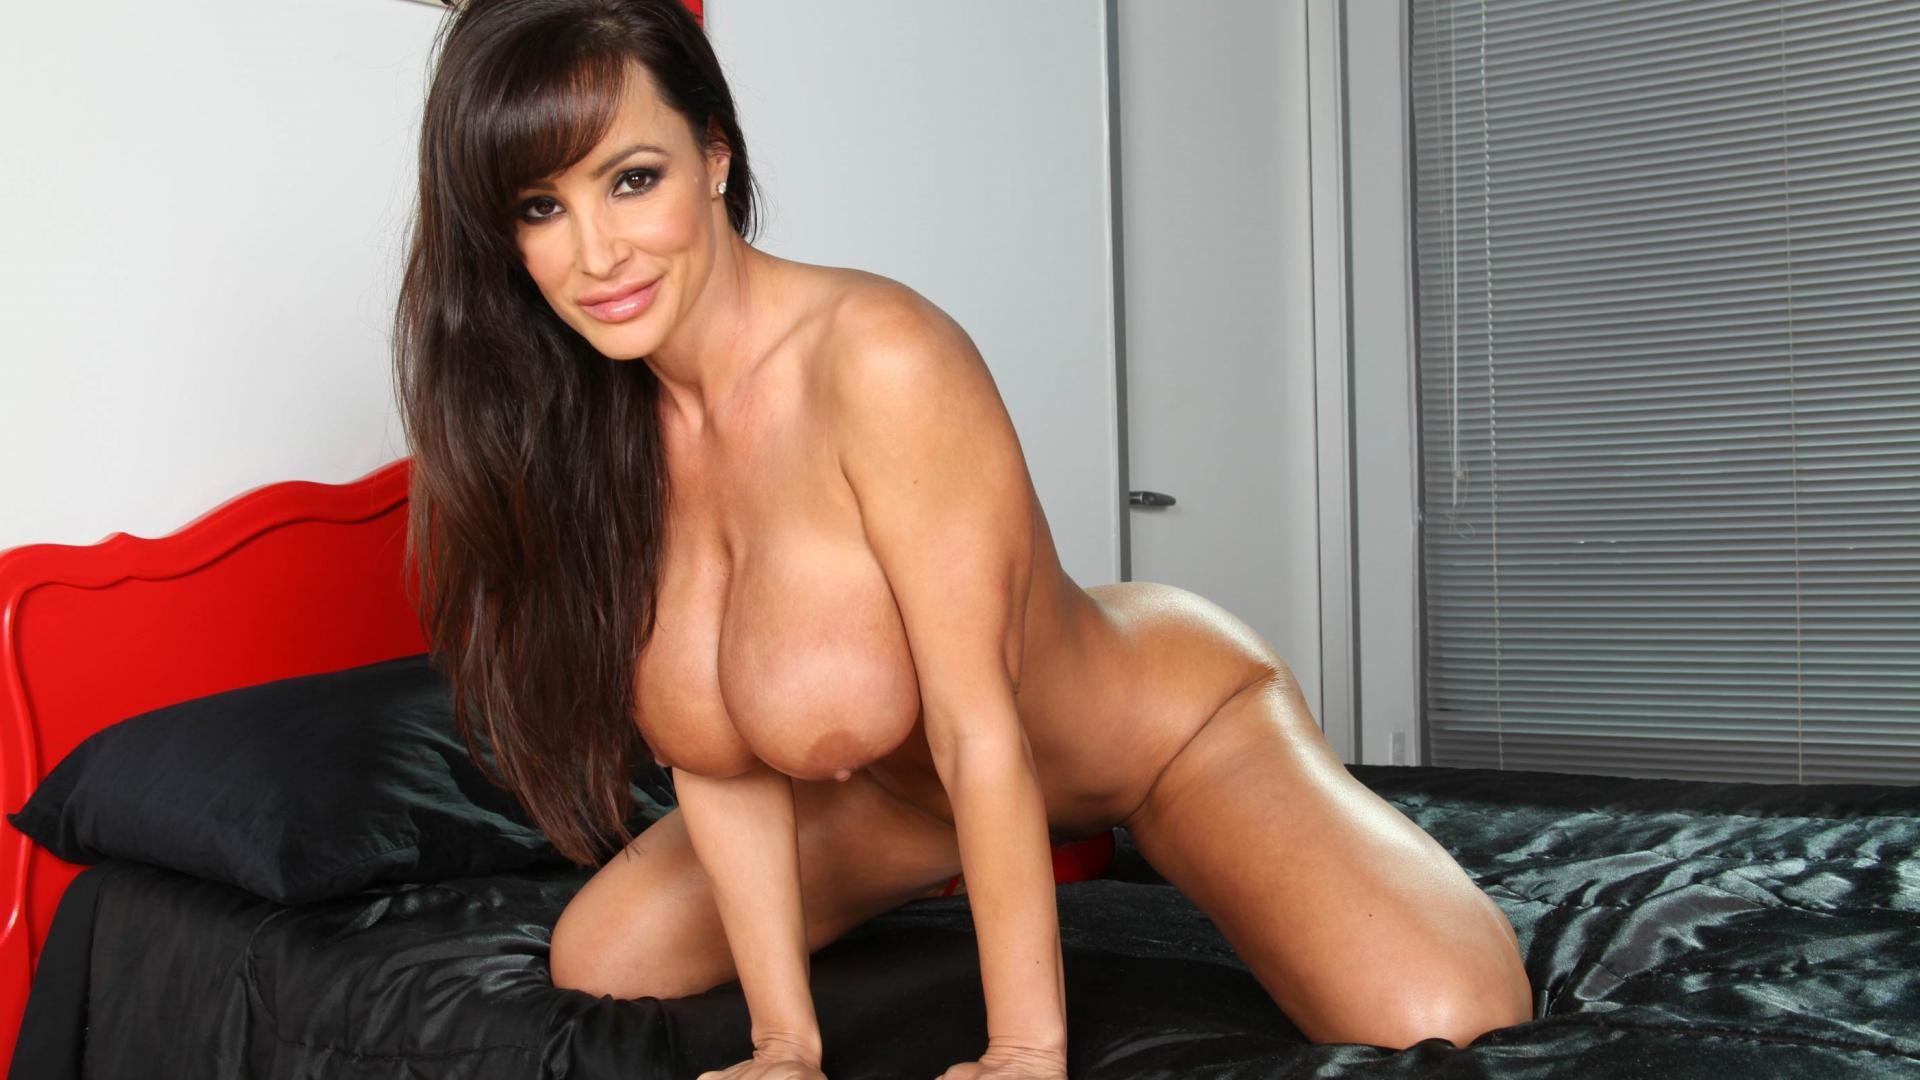 lisa ann nude wallpaper